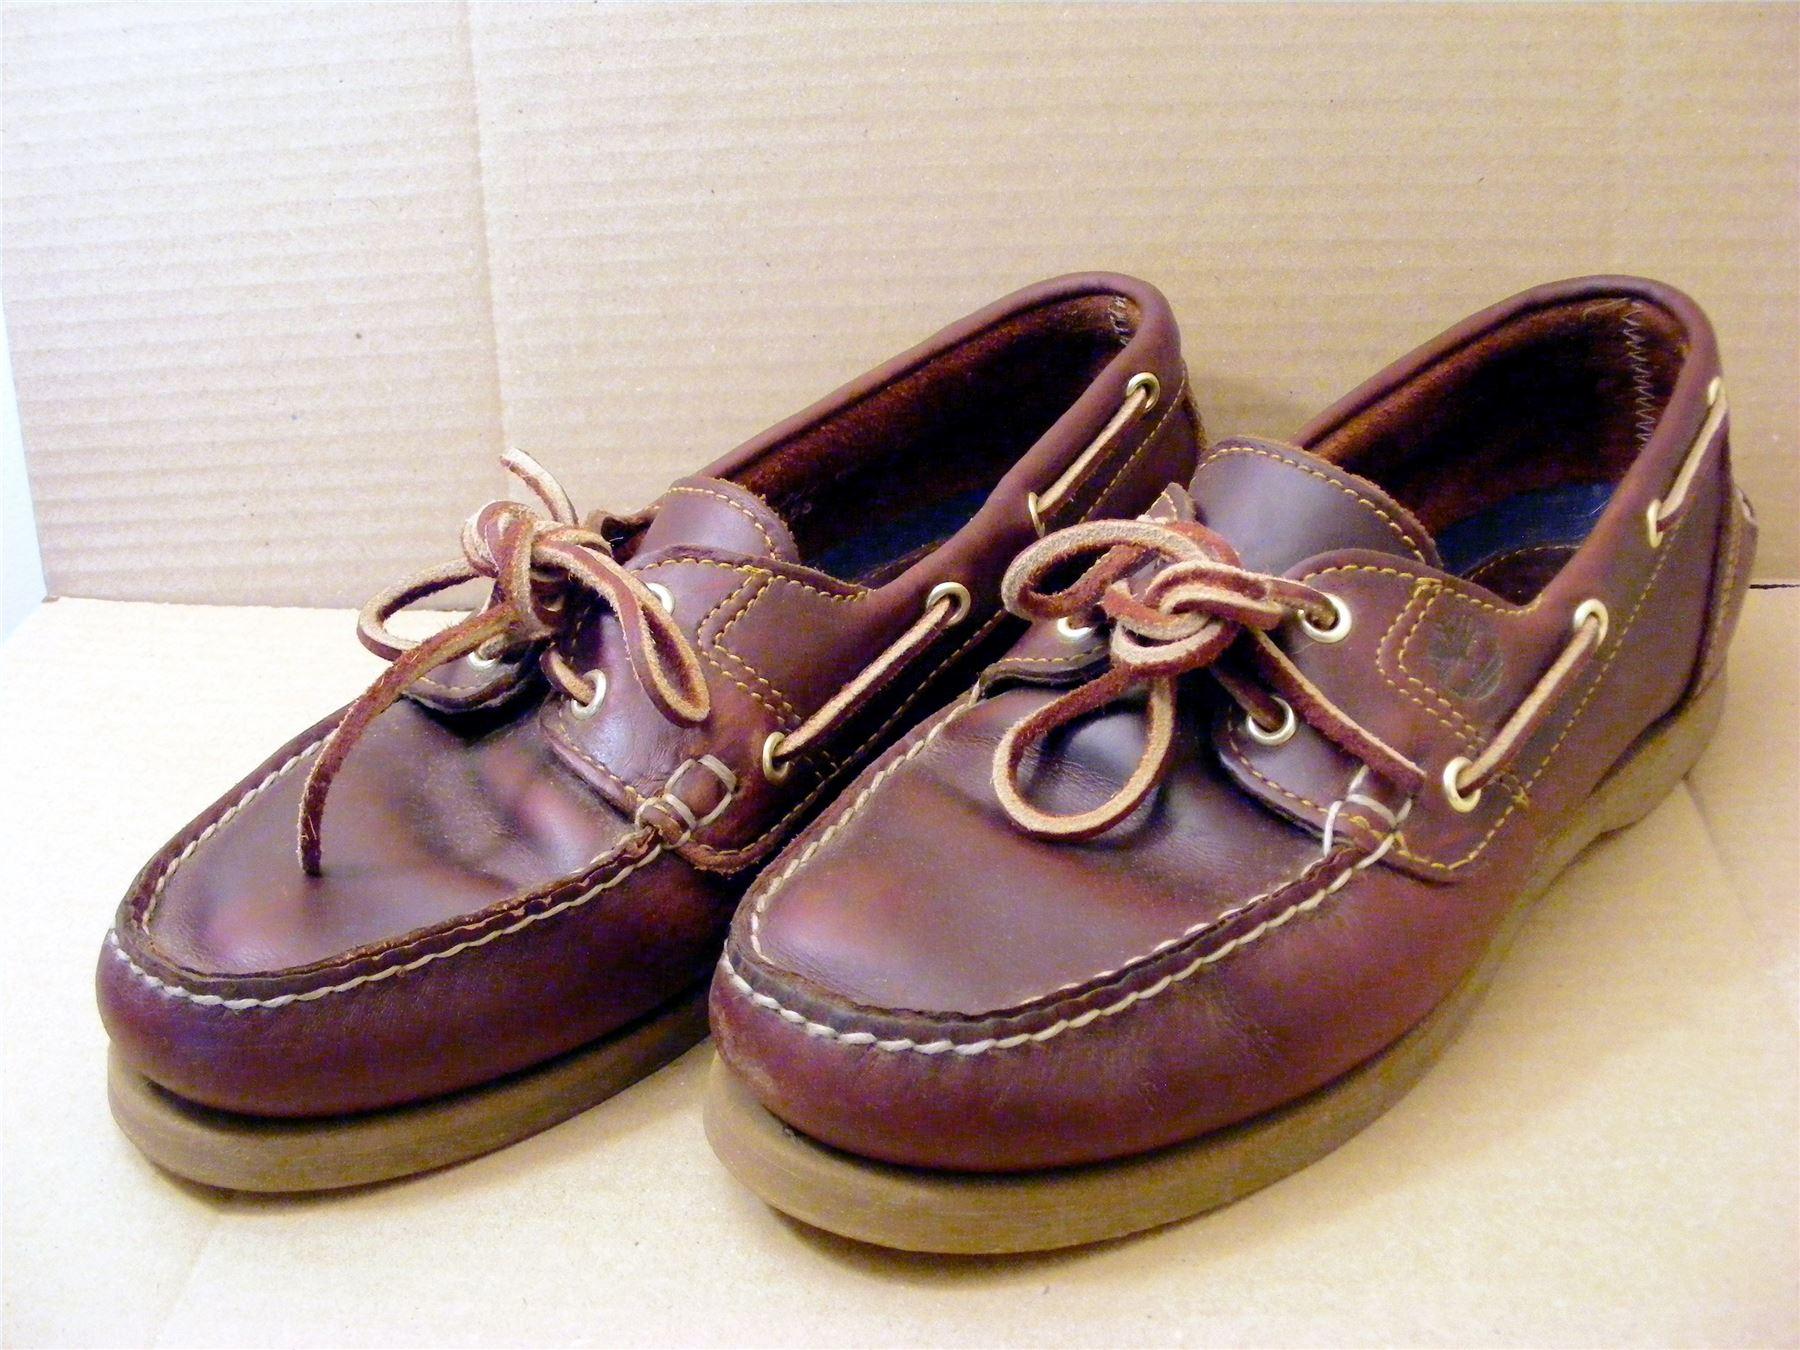 2 Timberland para uk náuticos ojos 5 tamaño mujer de Zapatos Classic Rootbeer marrón 5 wqxgYqrI